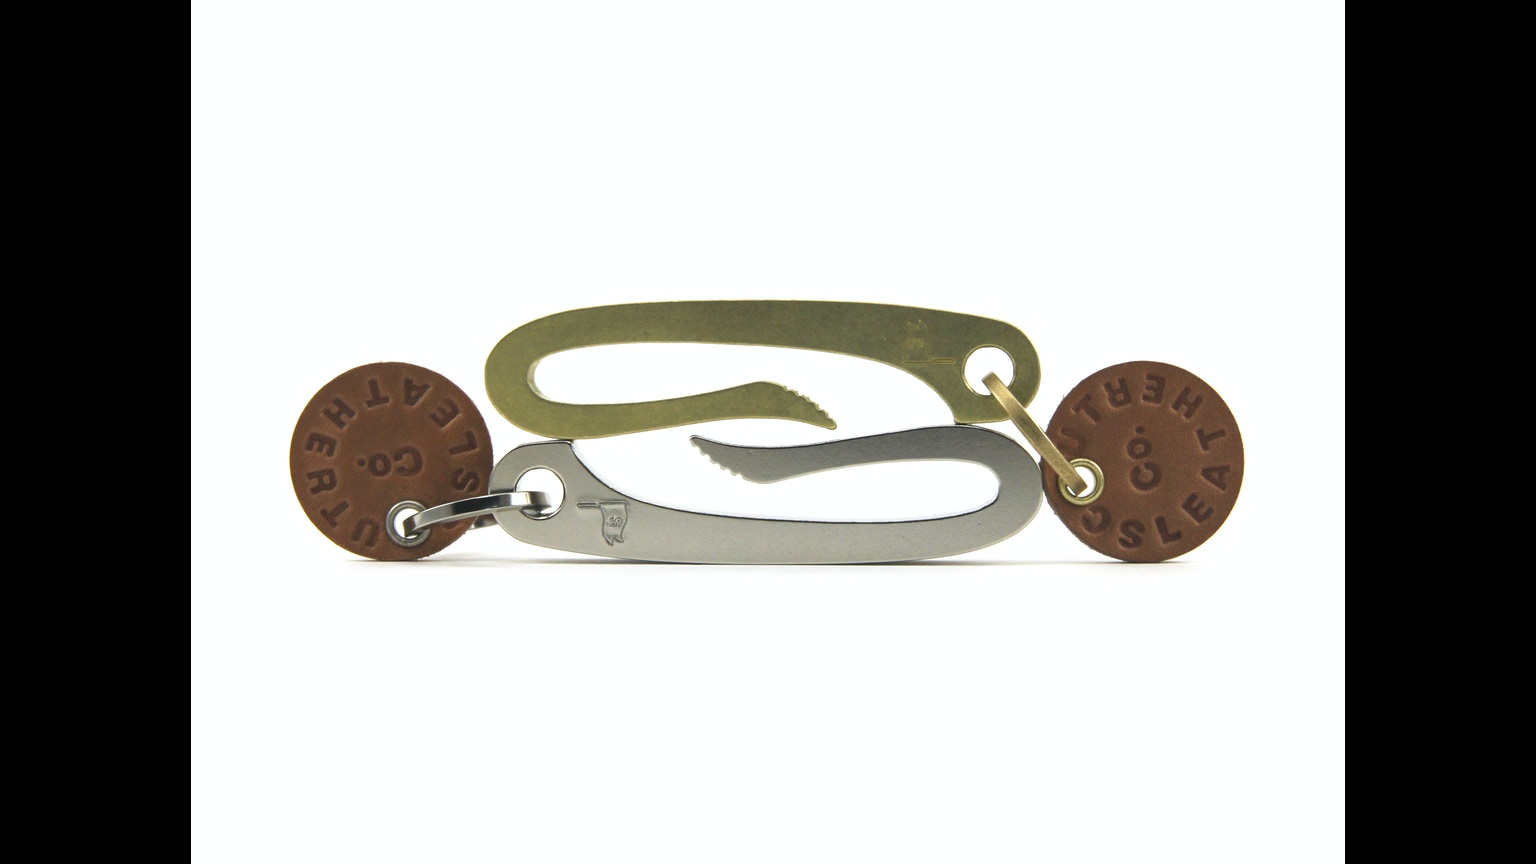 the scout hook keychain bottle opener by scout leather co kickstarter. Black Bedroom Furniture Sets. Home Design Ideas